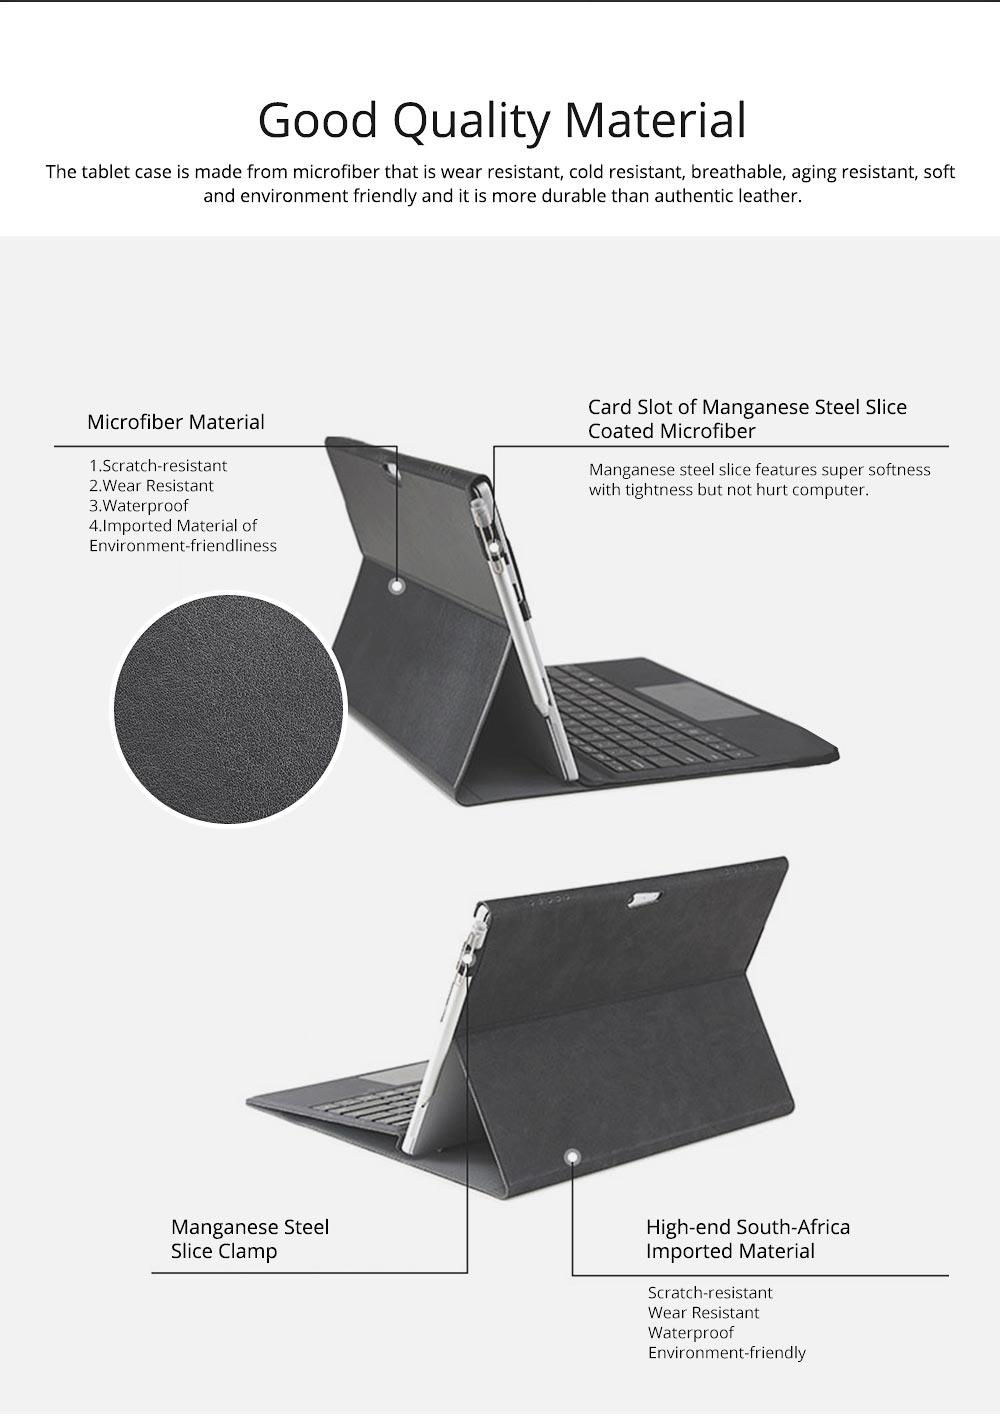 Laptop Case Pack for Microsoft Surface Pro 4, Surface Pro 3, Surface Pro 5, Surface Pro 6 Full Protective Pouch Case, Tablet PC Laptop Case 1